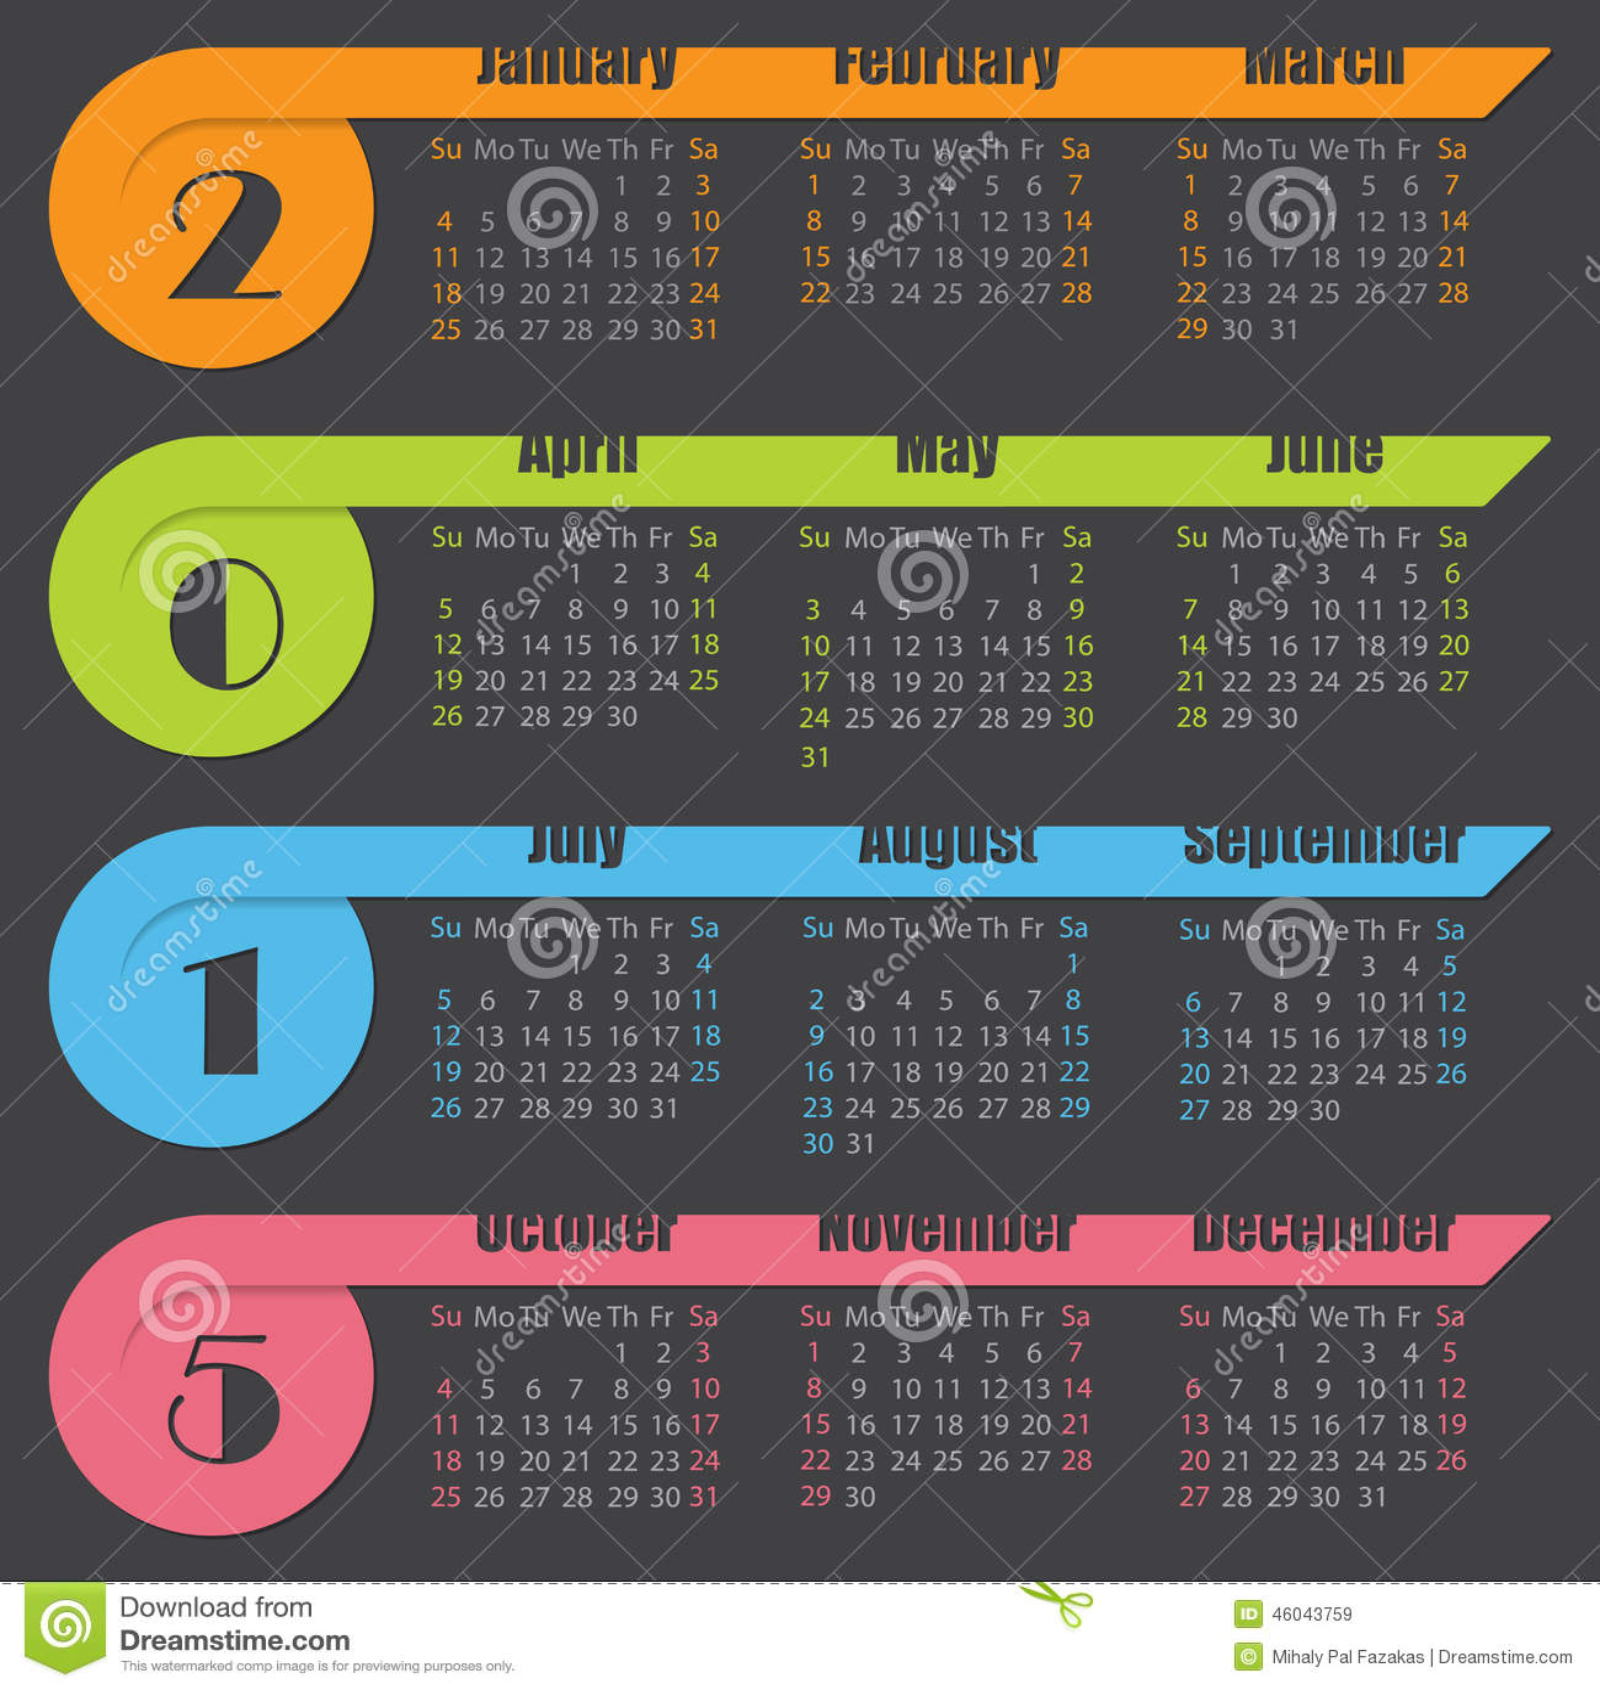 Calendar Ribbon Design : Calendar design with ribbons stock illustration